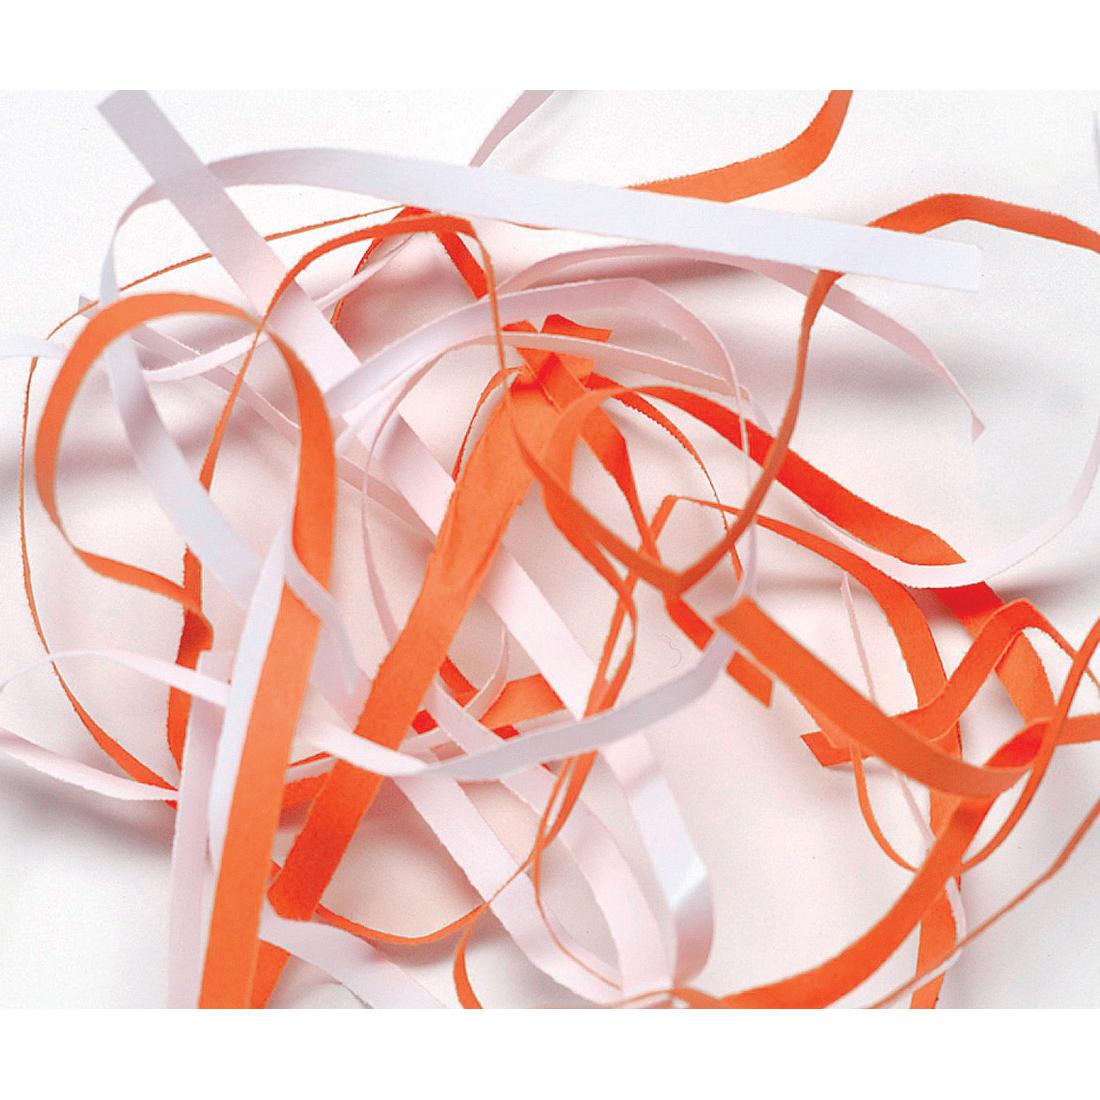 Fellowes 485i Shredder Ribbon Cut DIN2 P-4 Ref 4699501